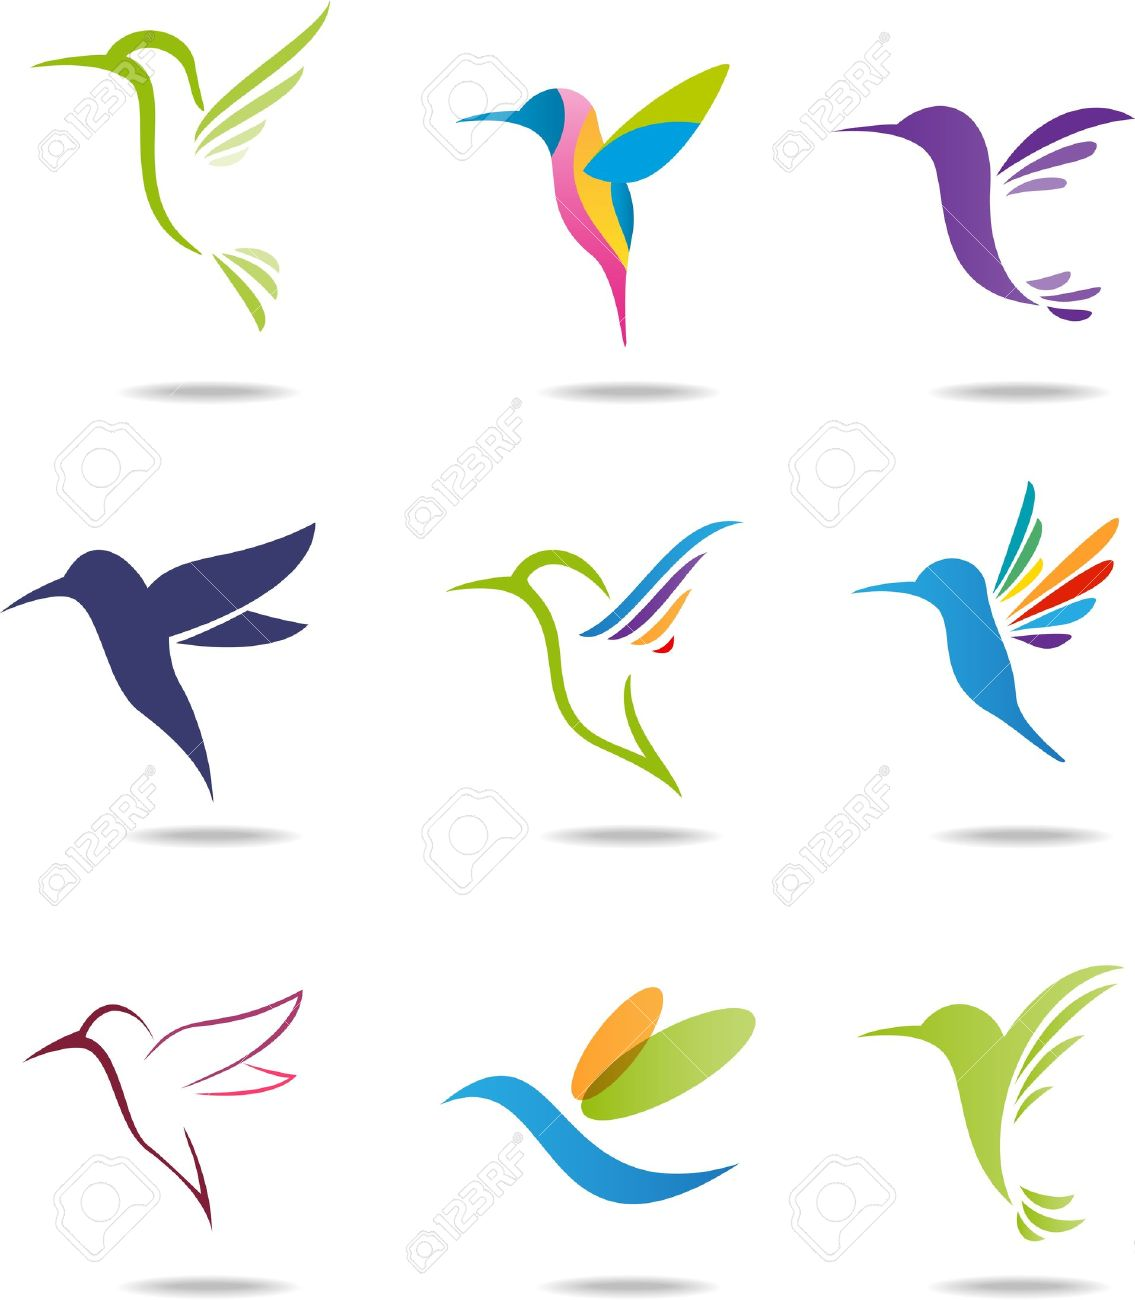 Hummingbird Stock Vector - 21018072